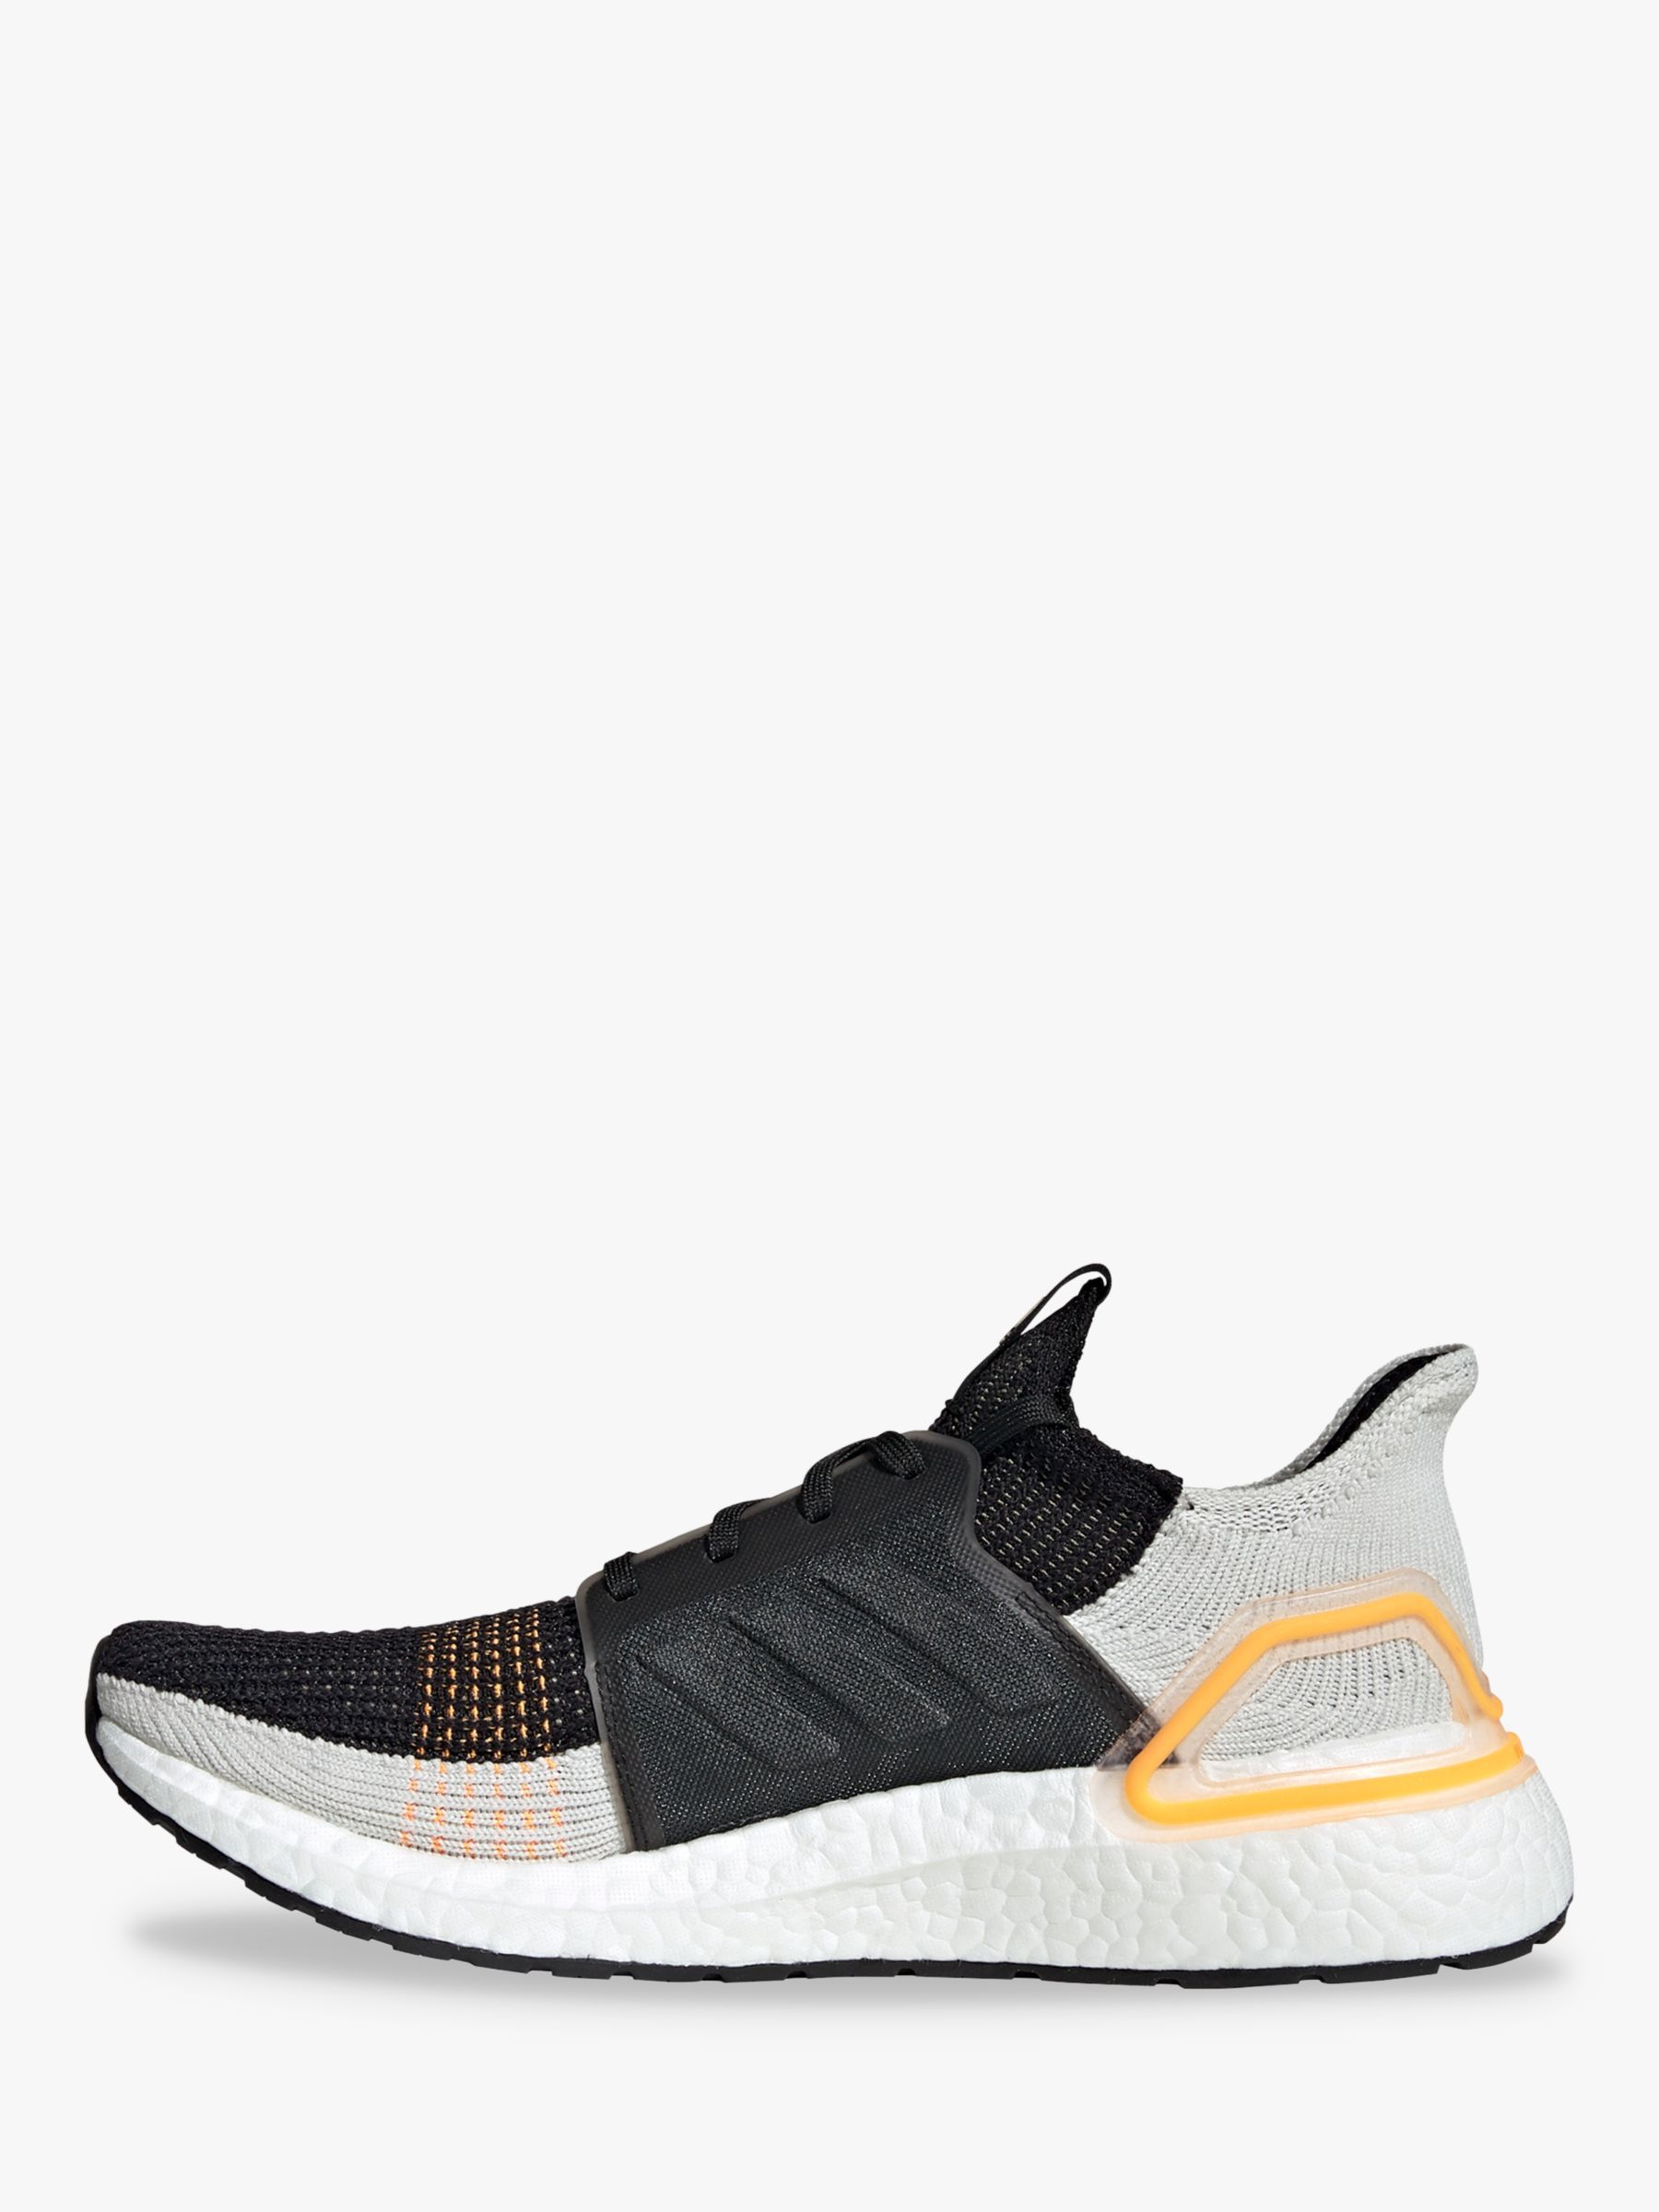 adidas UltraBOOST 19 Men's Running Shoes, Trace CargoRaw